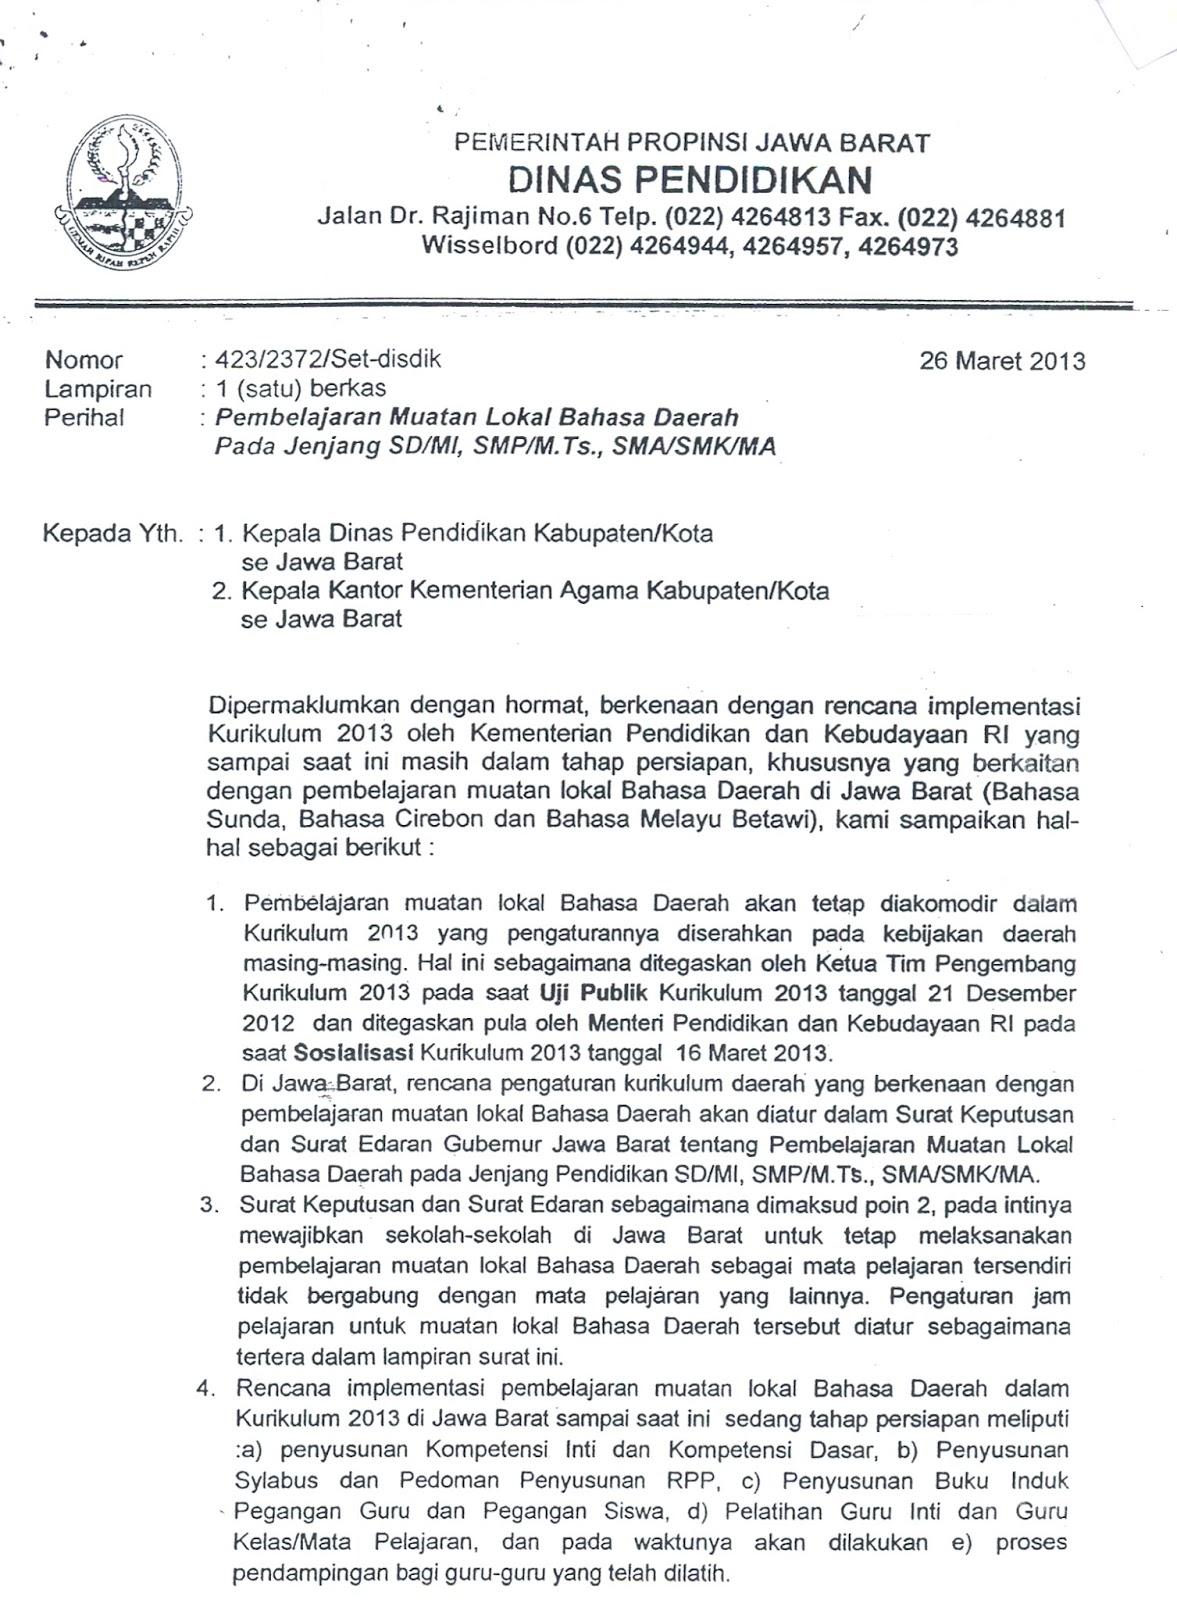 Contoh Kop Surat Resmi Takengon Propinsi Fapolsocals Blog